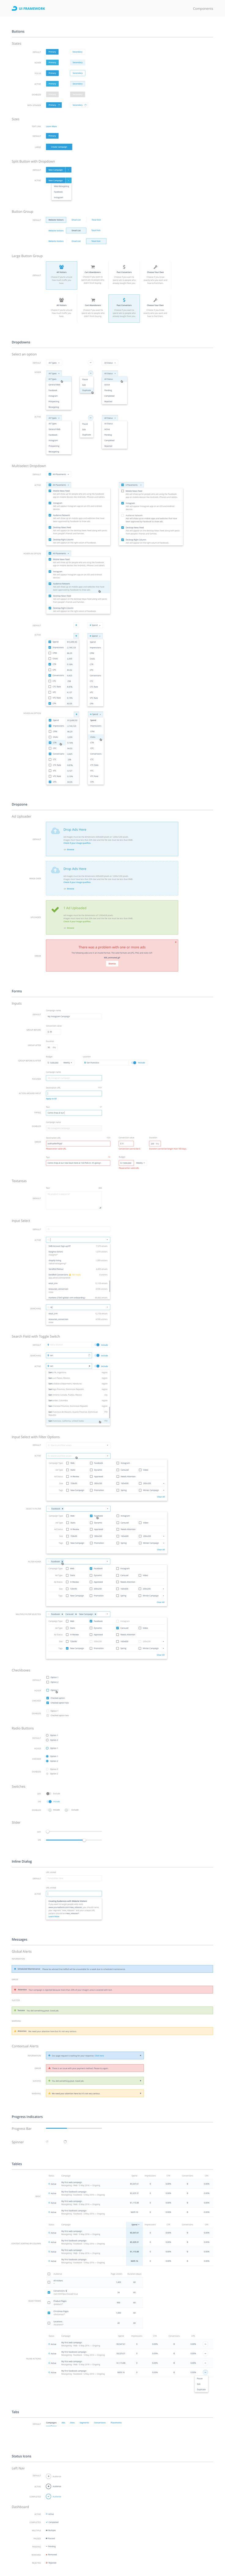 AdRoll UI Framework – Style guide by Mason Lee